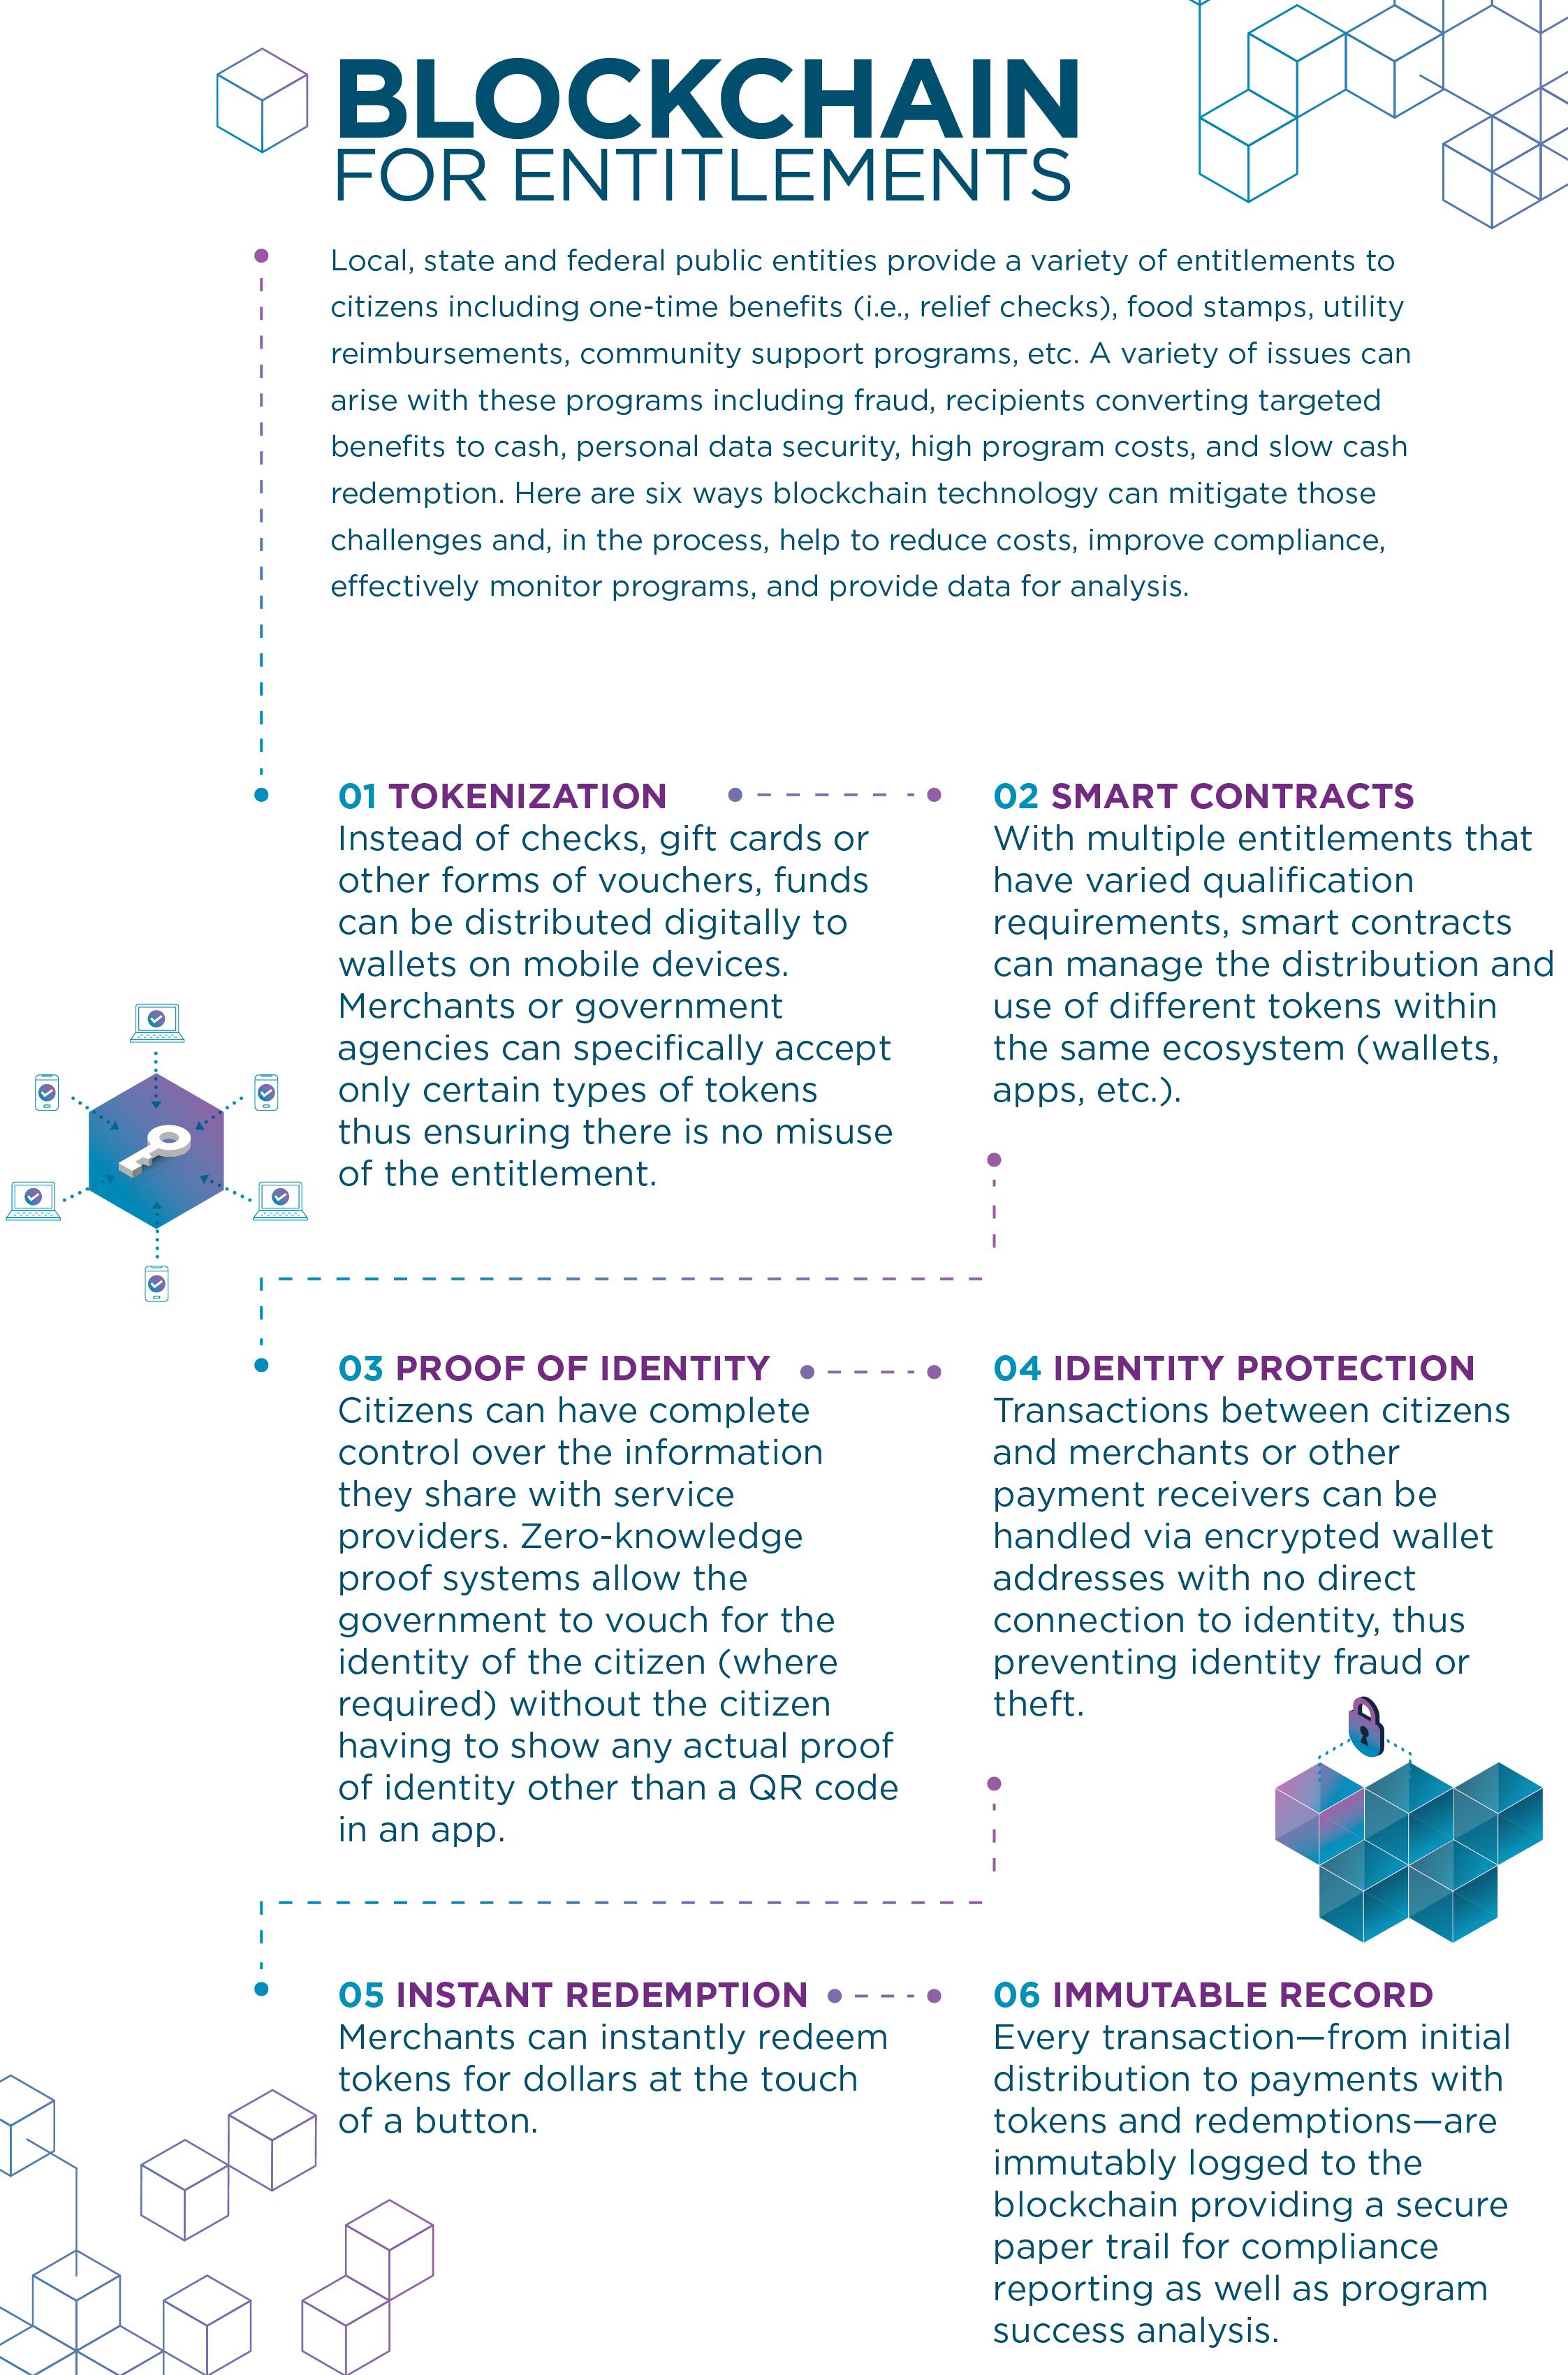 Blockchain for Entitlements graphic